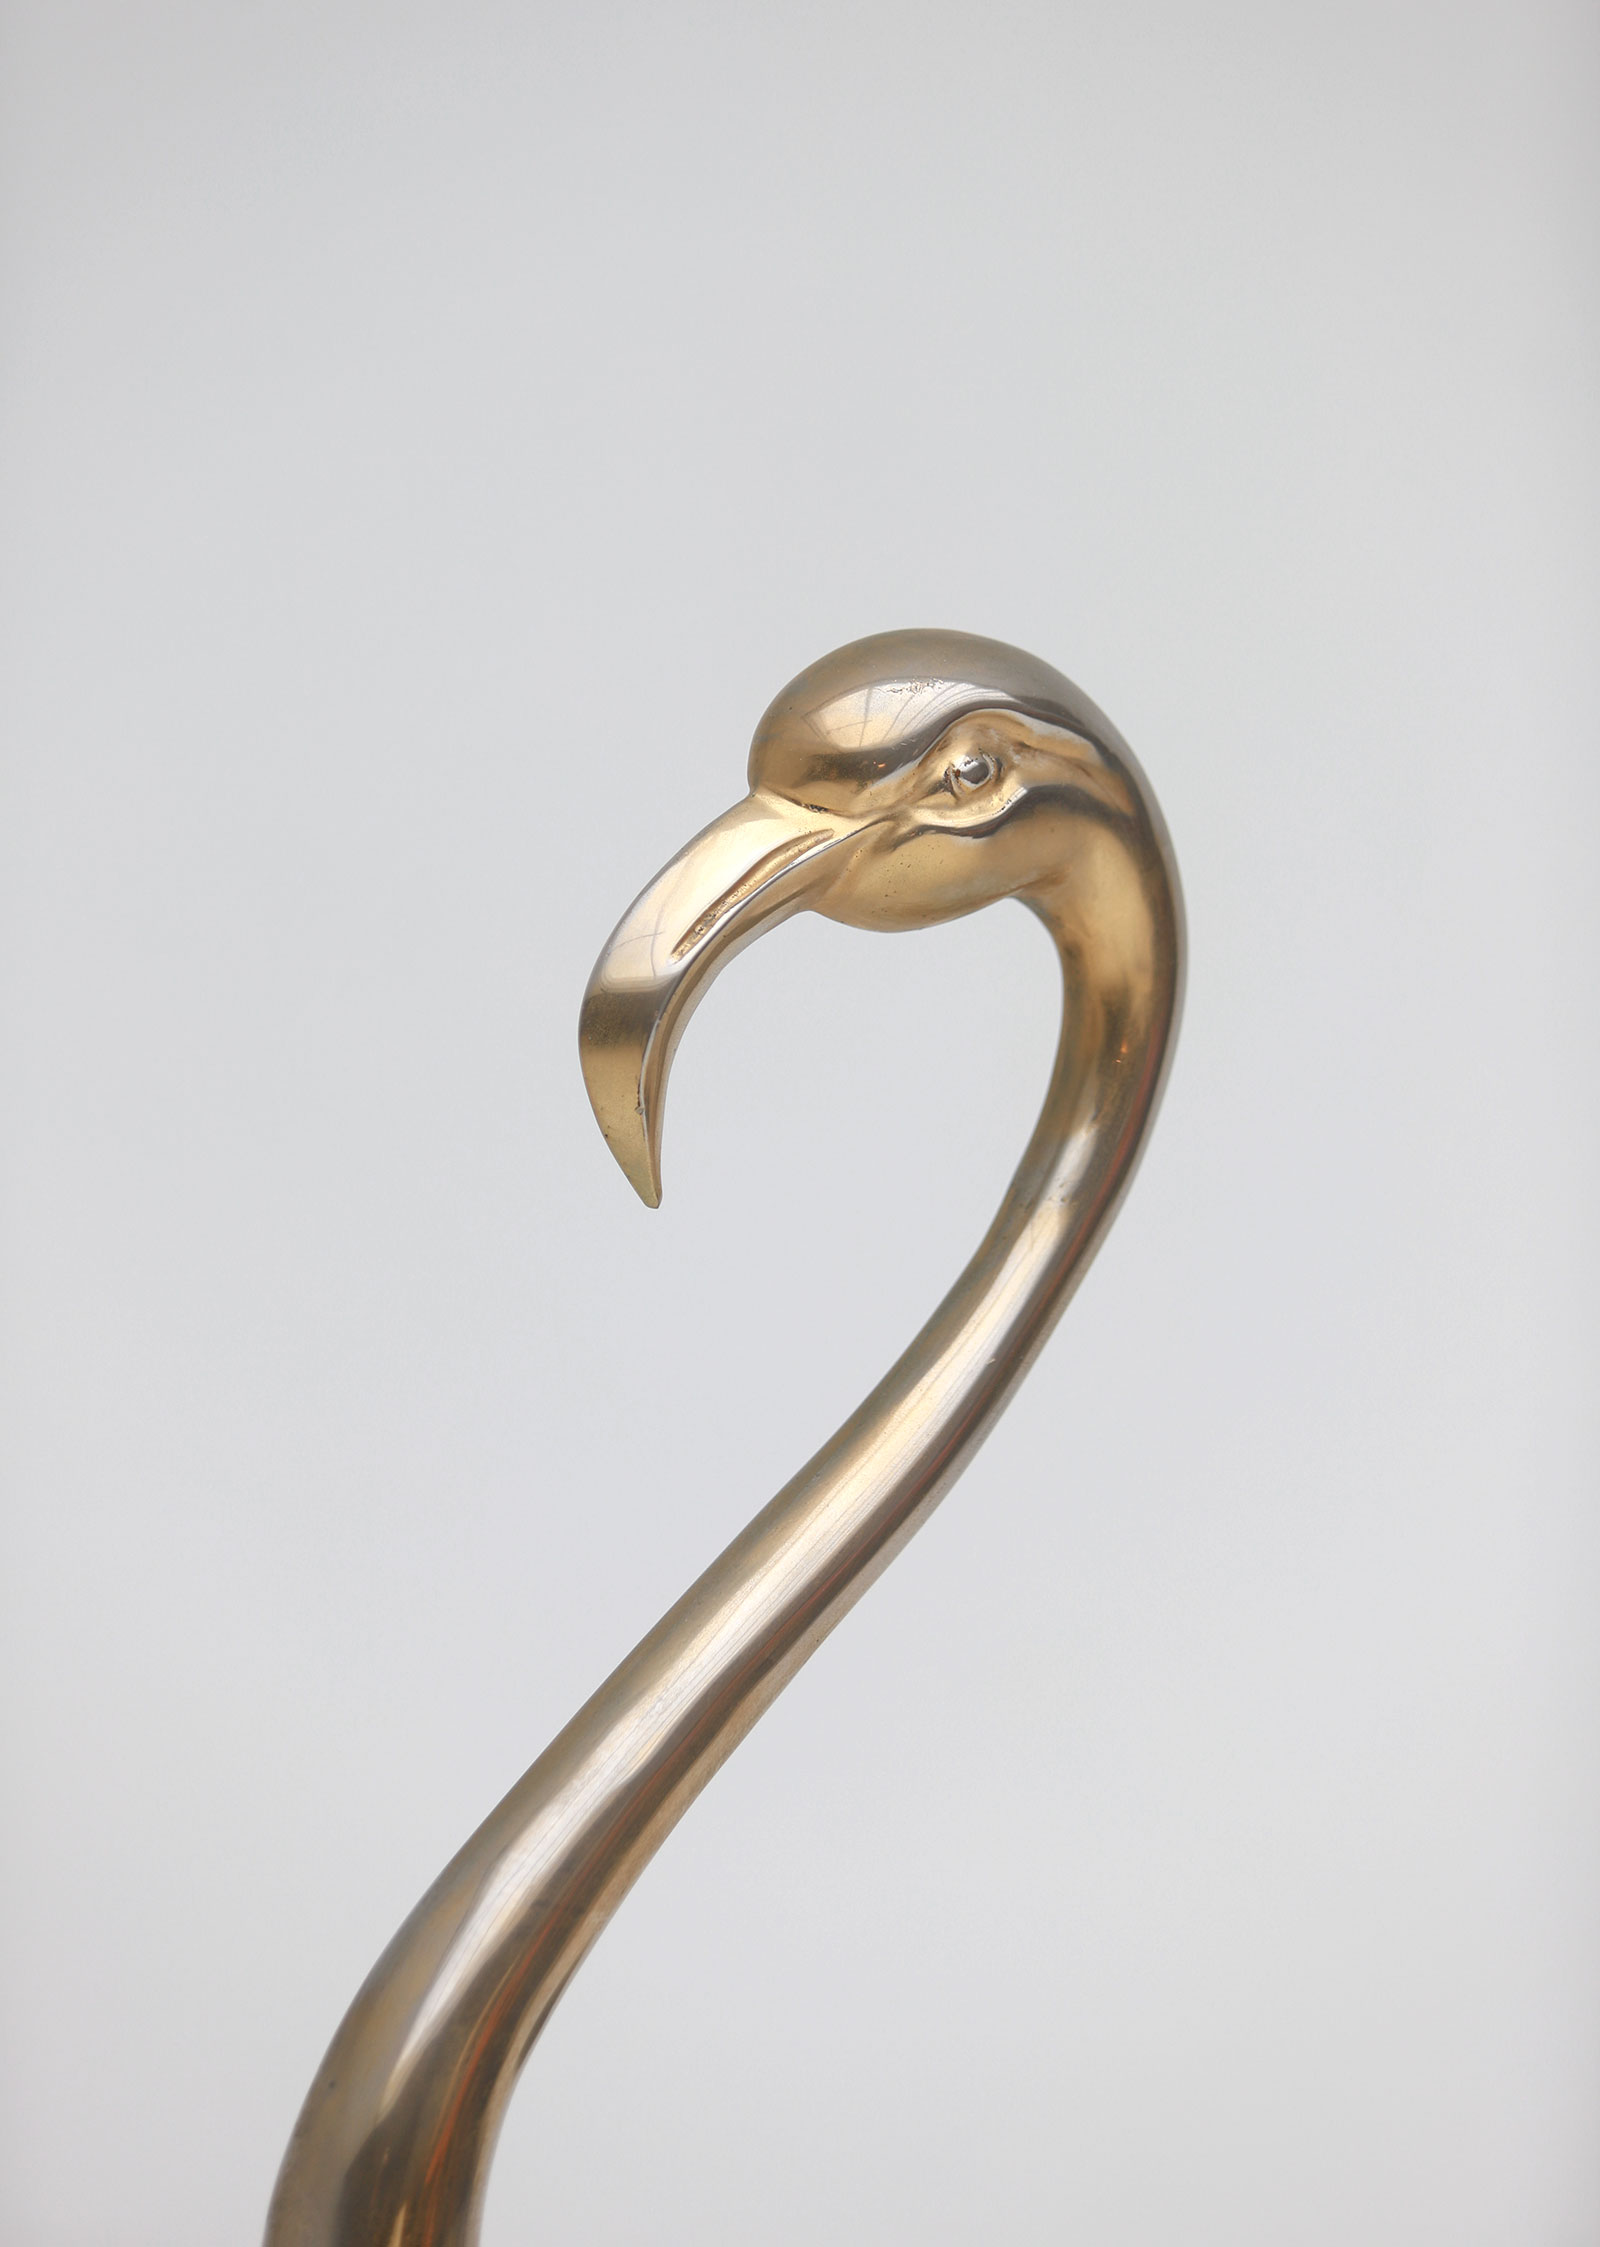 Fondica Lifesize Brass Flamingo 1970simage 11